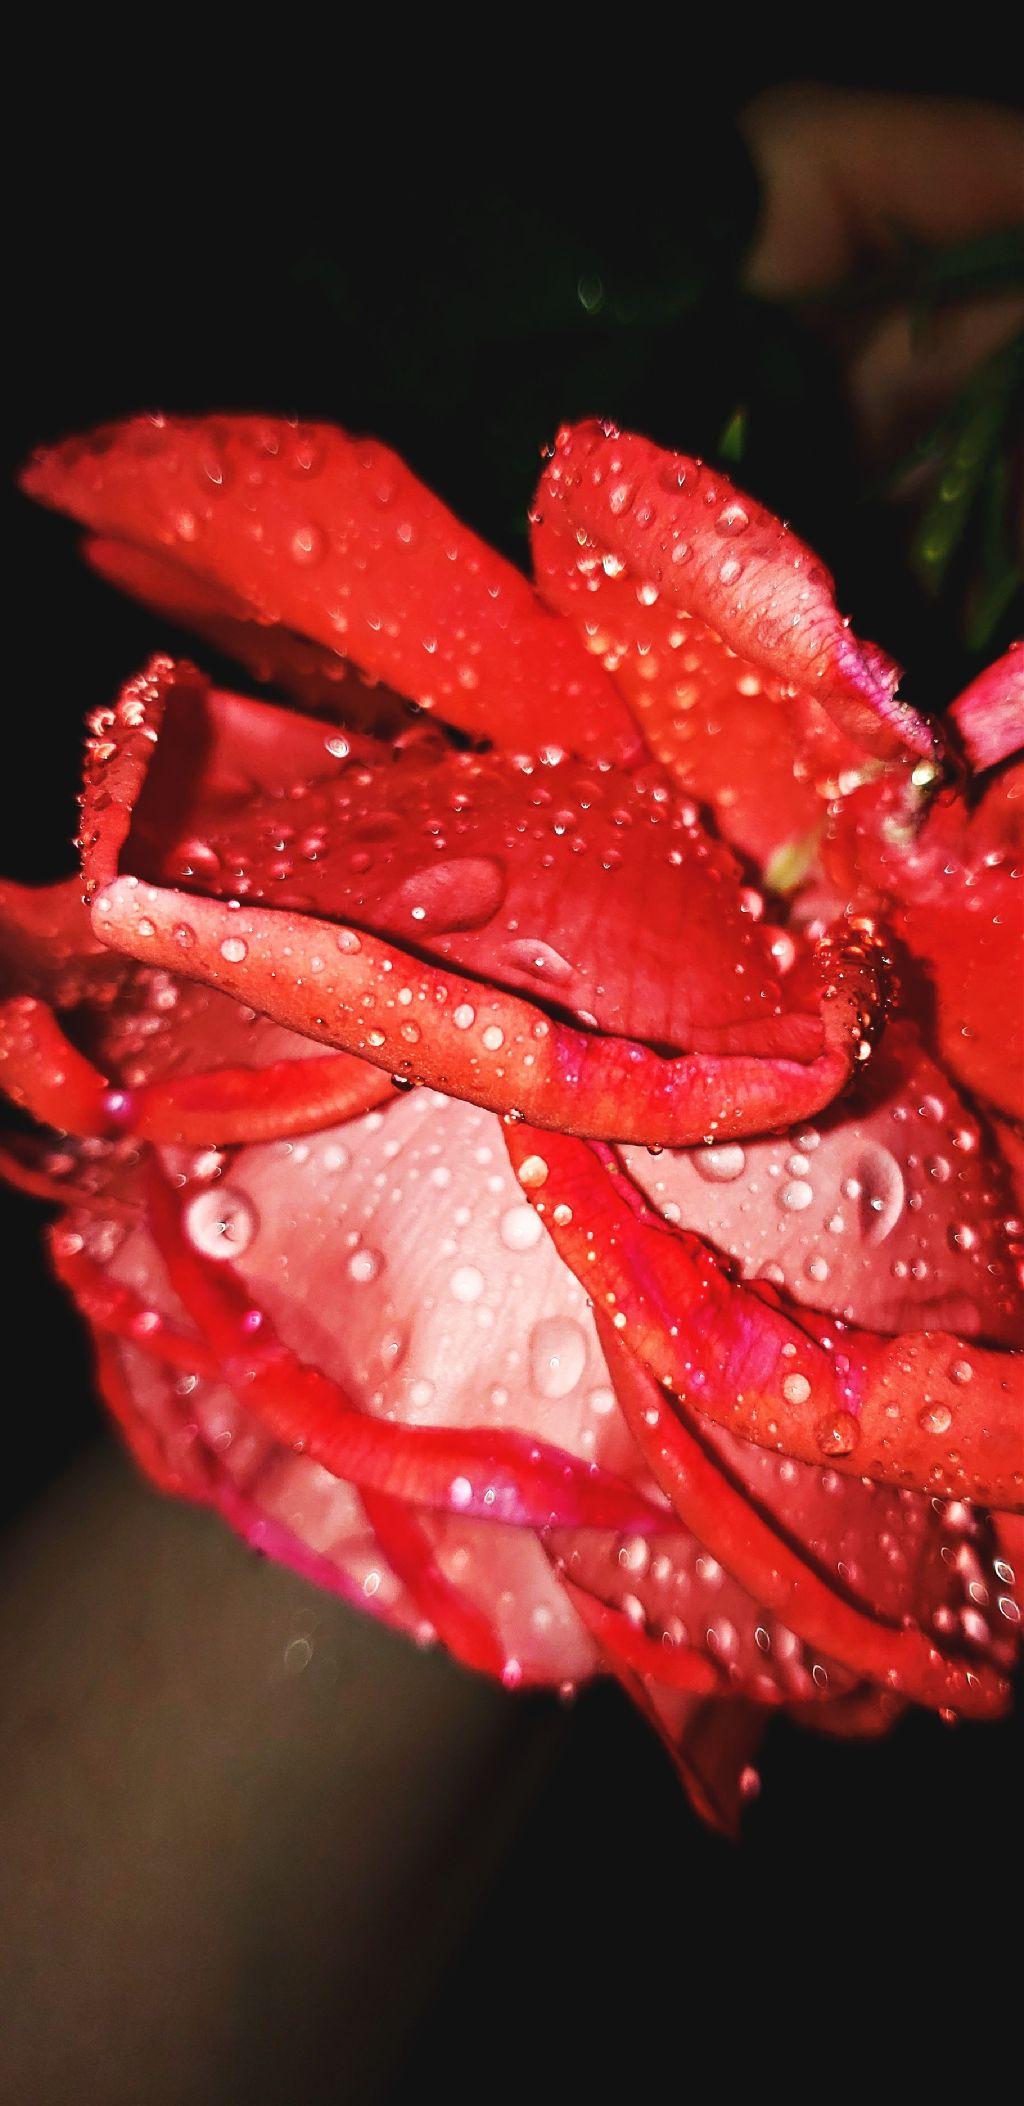 #dew #rose #oregon #rain #pnw #pnwlife #photography